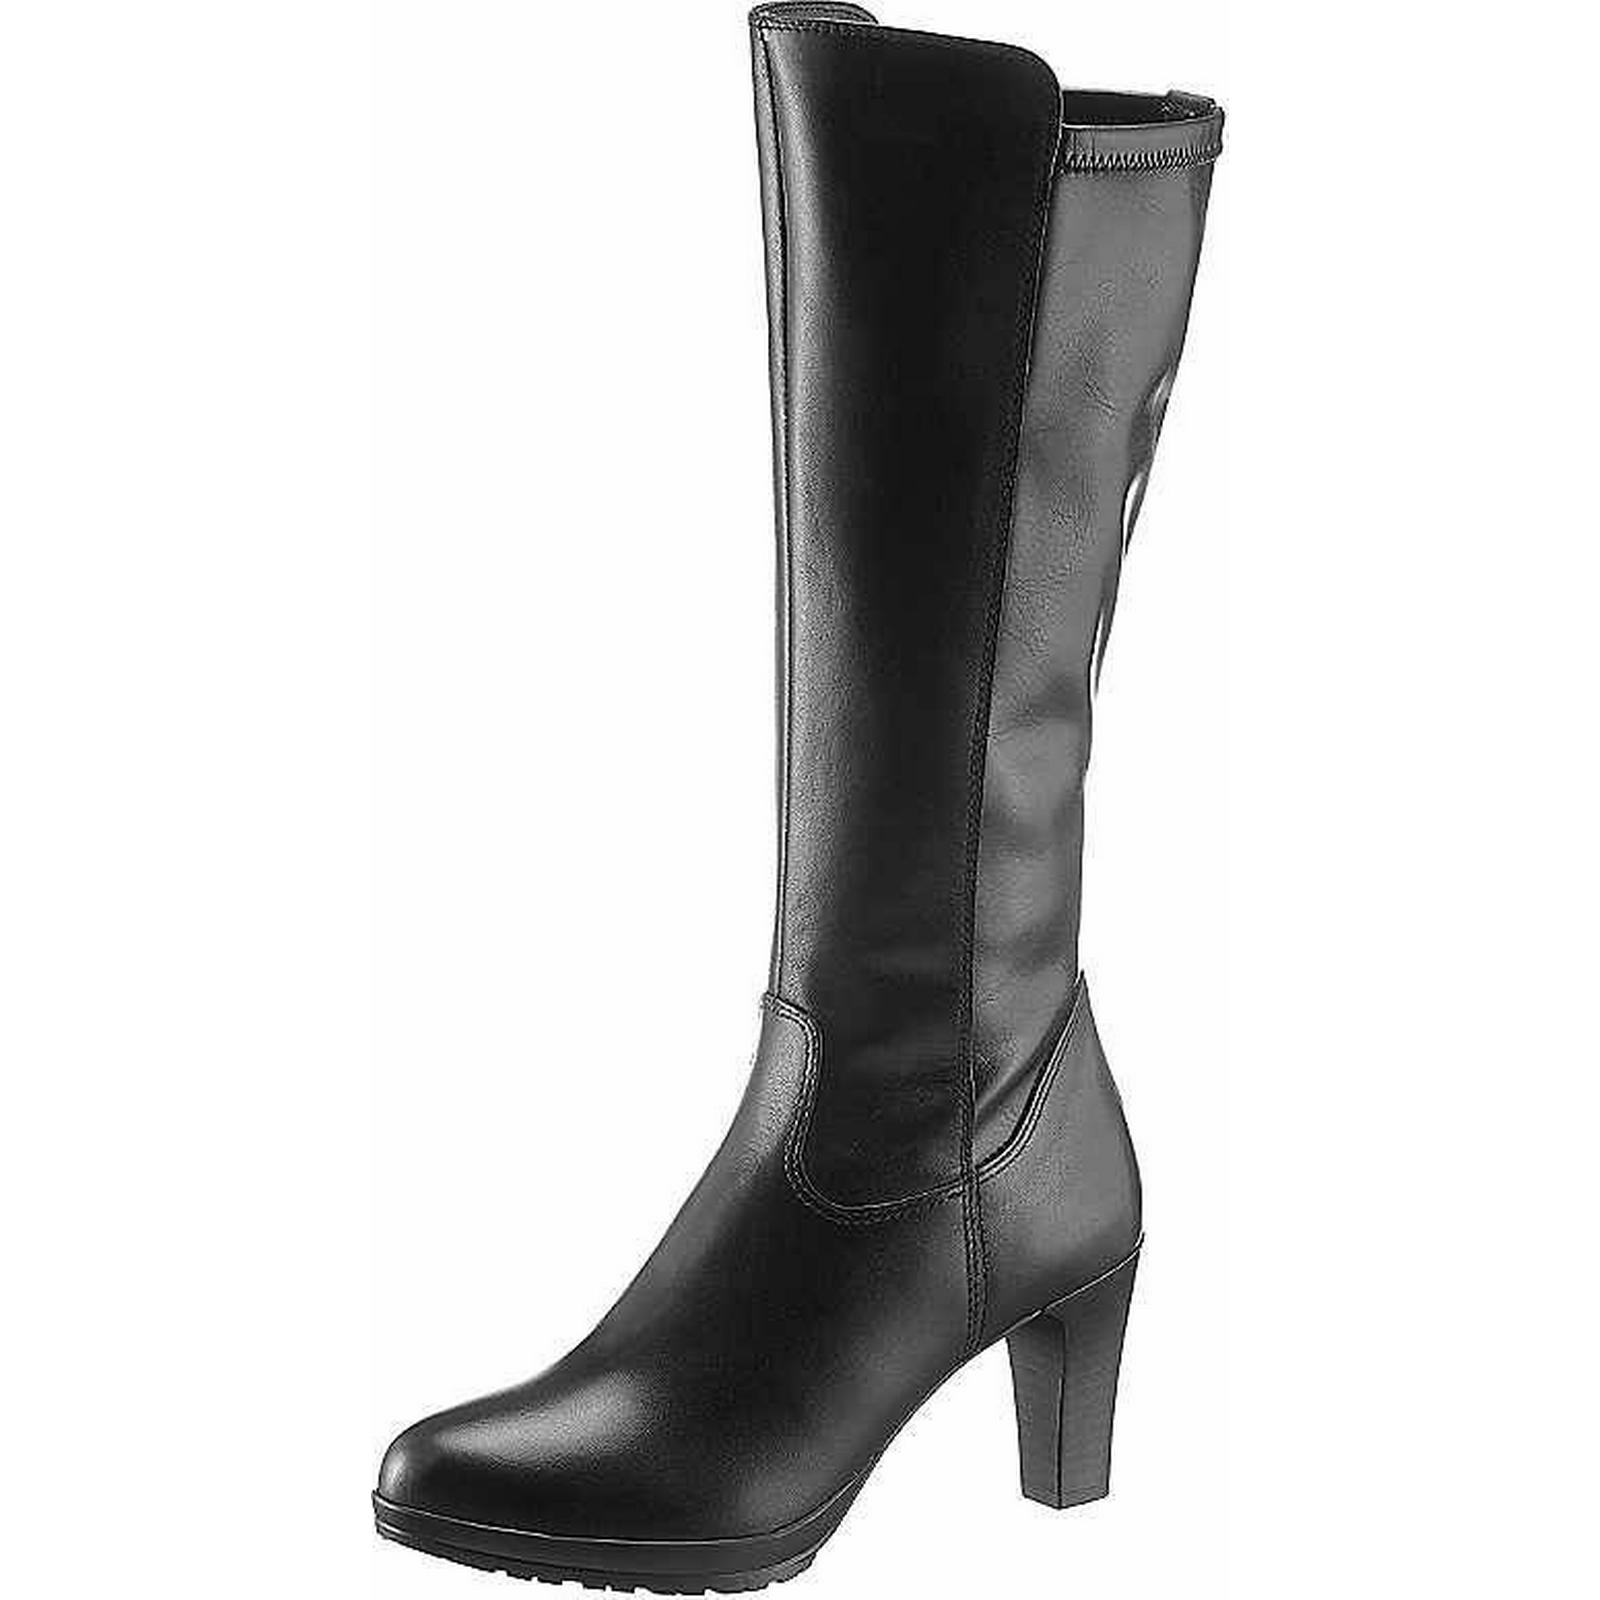 Tamaris High Heel Heel High Boots by Tamaris 27b355